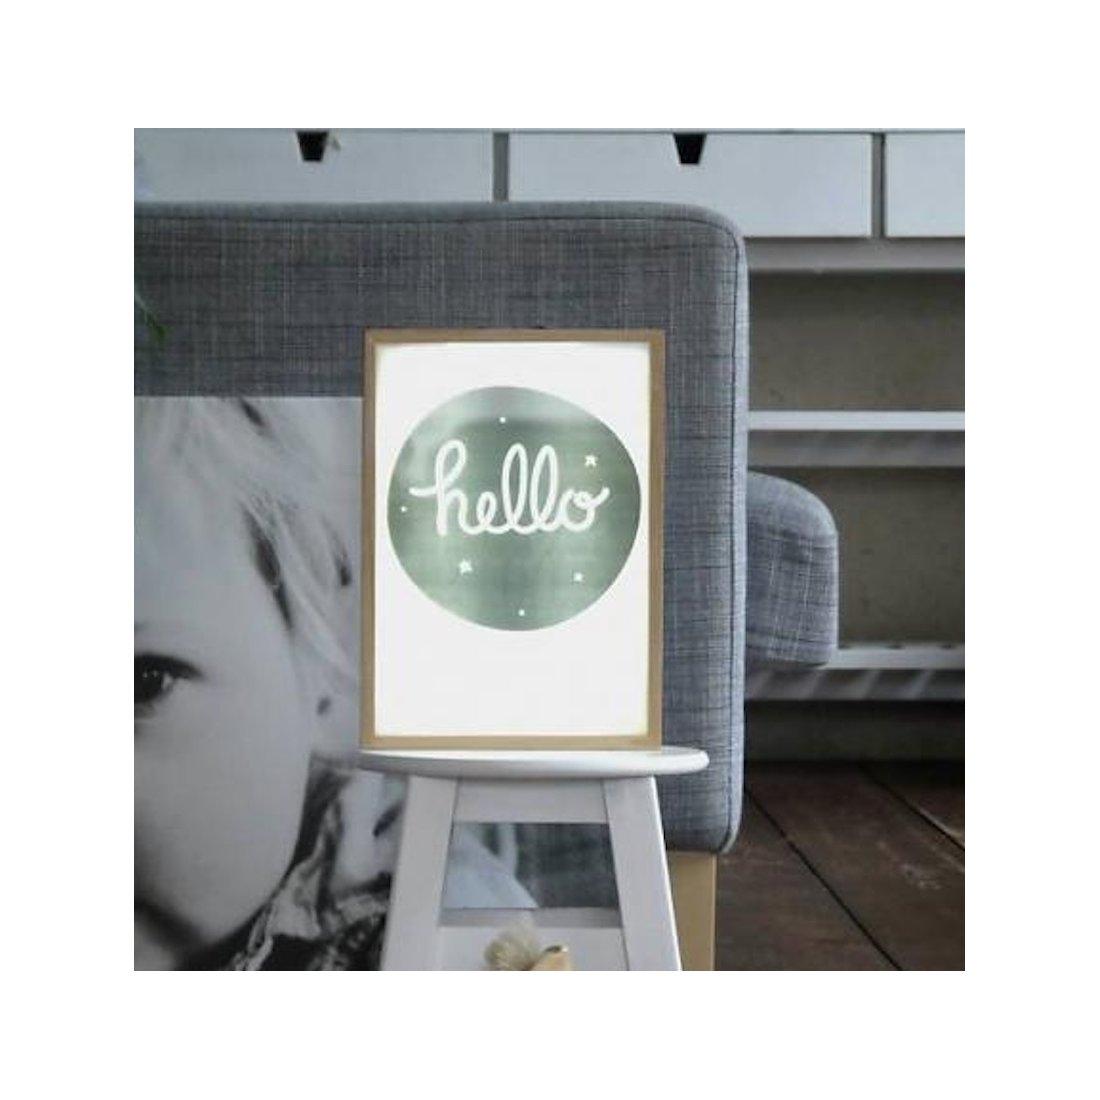 caab7f805 Póster 'Hello' para caja de luz - A little lovely company - TuBebebox